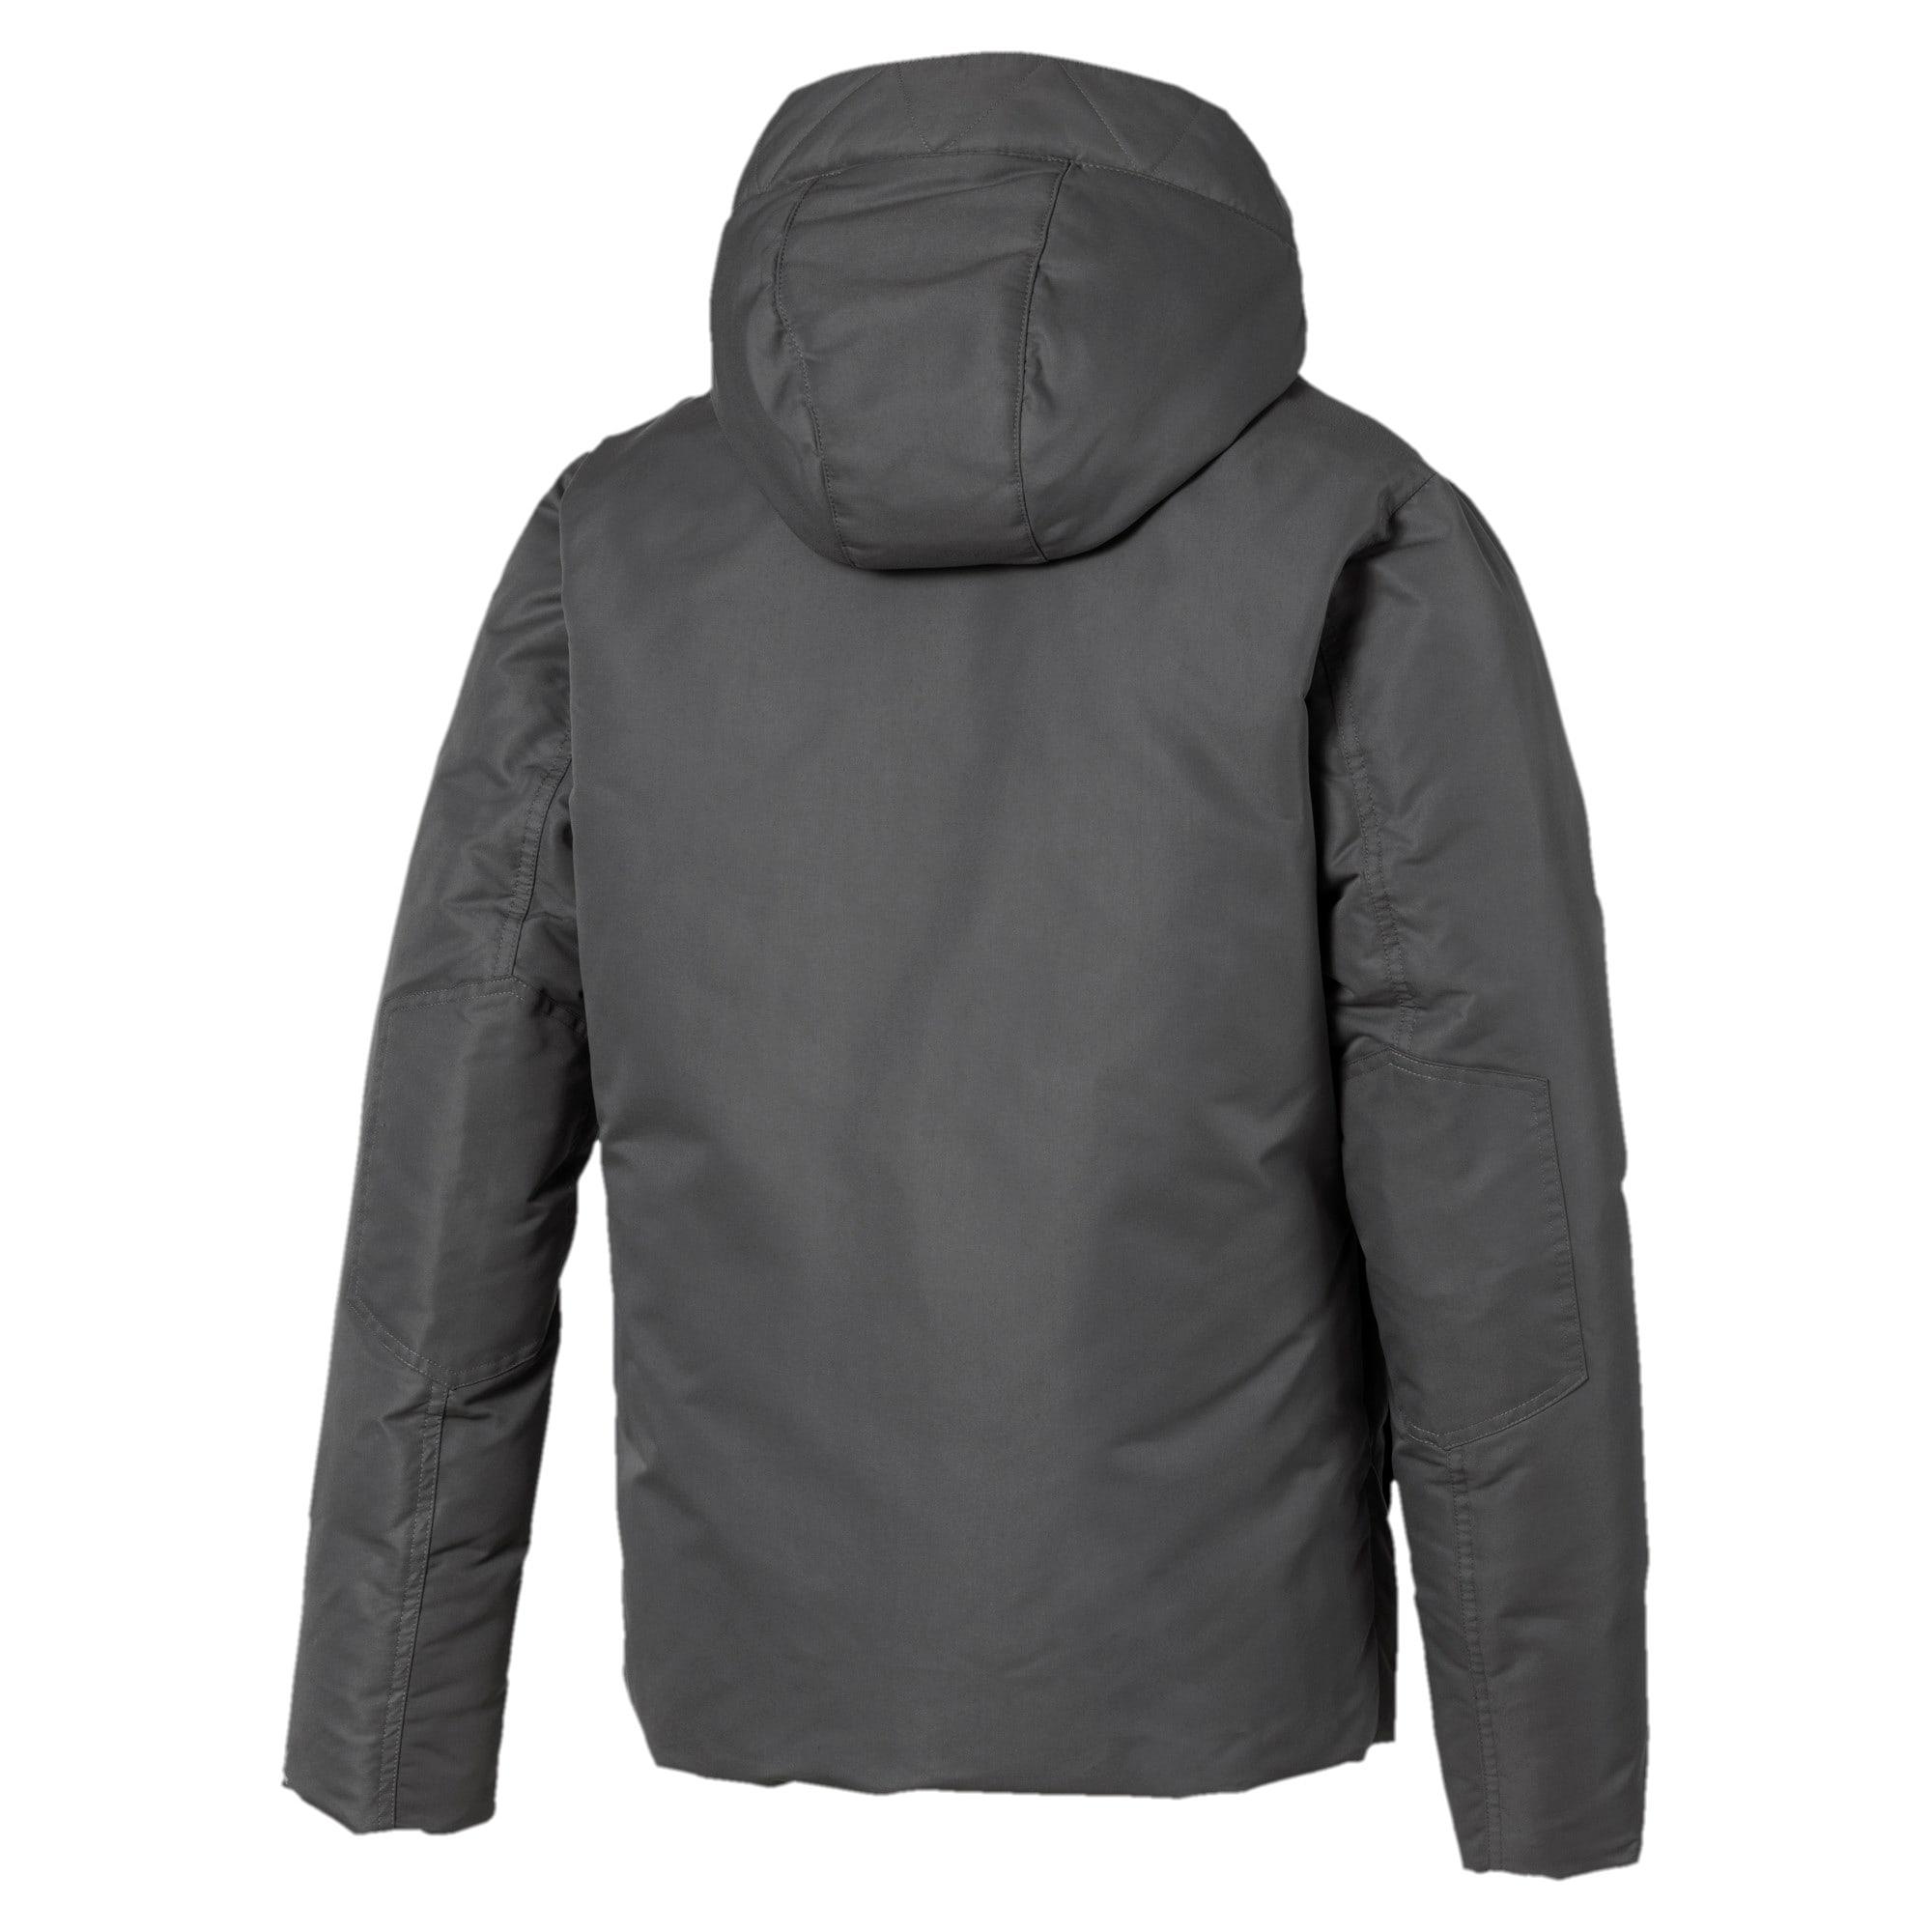 Thumbnail 5 of Streetstyle 480 HD Down Men's Jacket, CASTLEROCK, medium